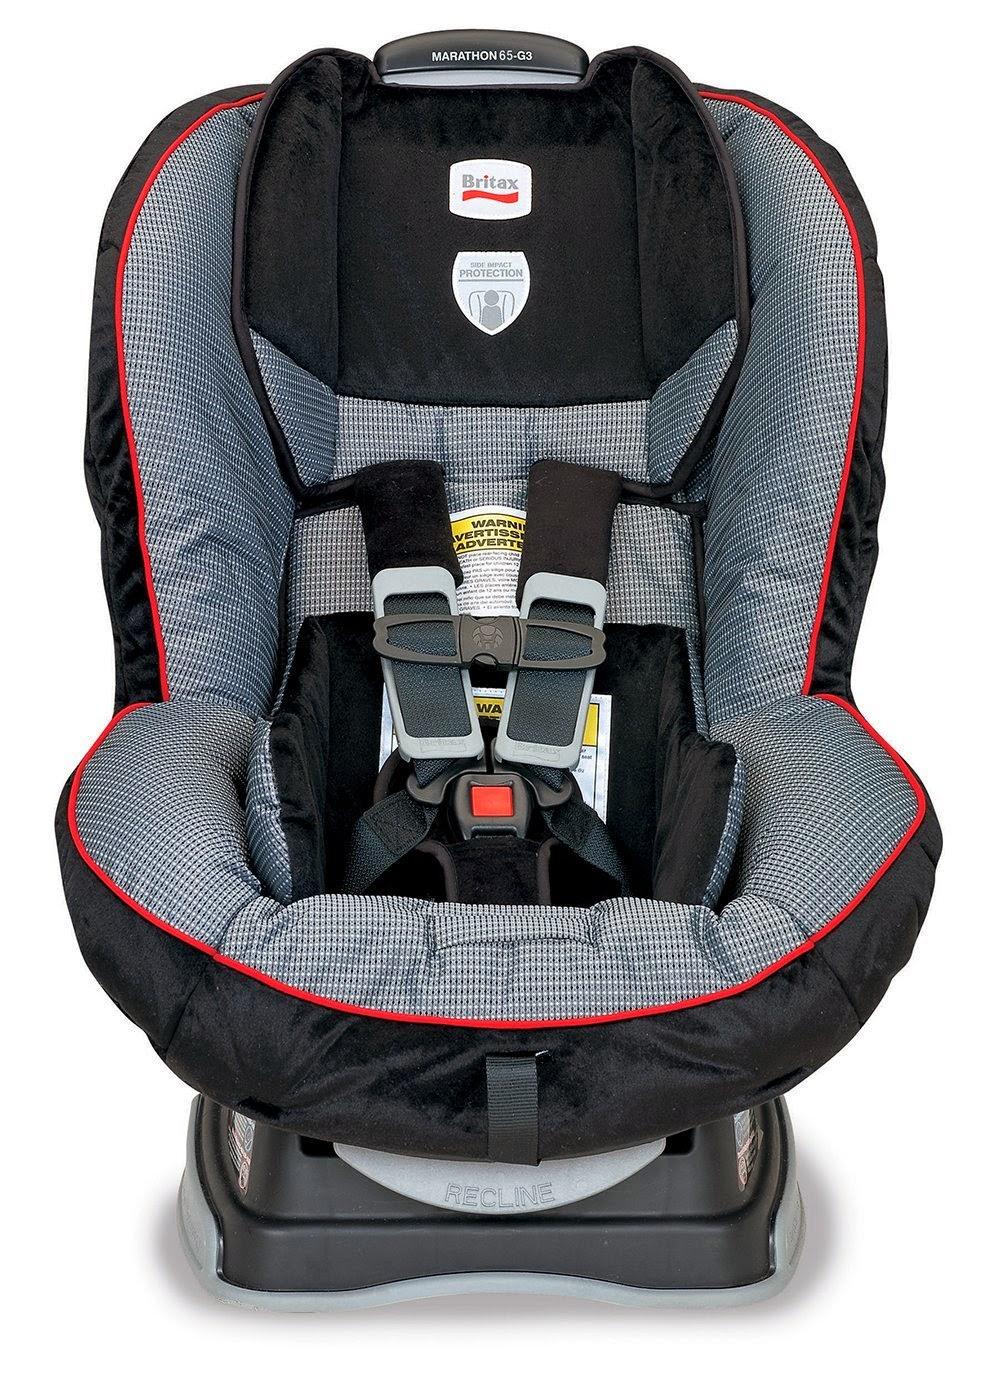 britax marathon 70 g3 convertible car seat. Black Bedroom Furniture Sets. Home Design Ideas